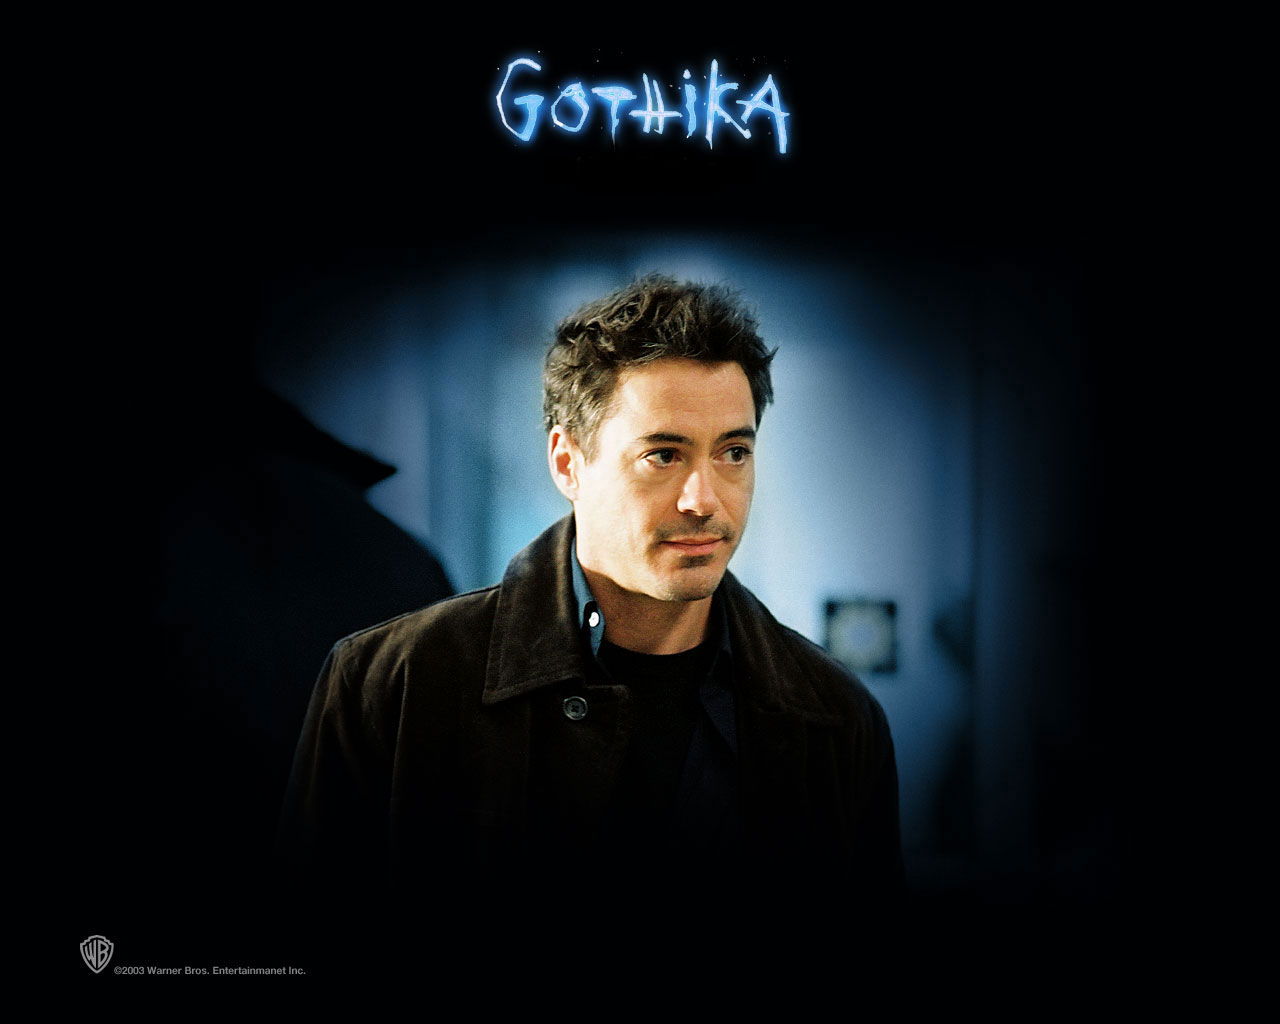 Robert in Gothika